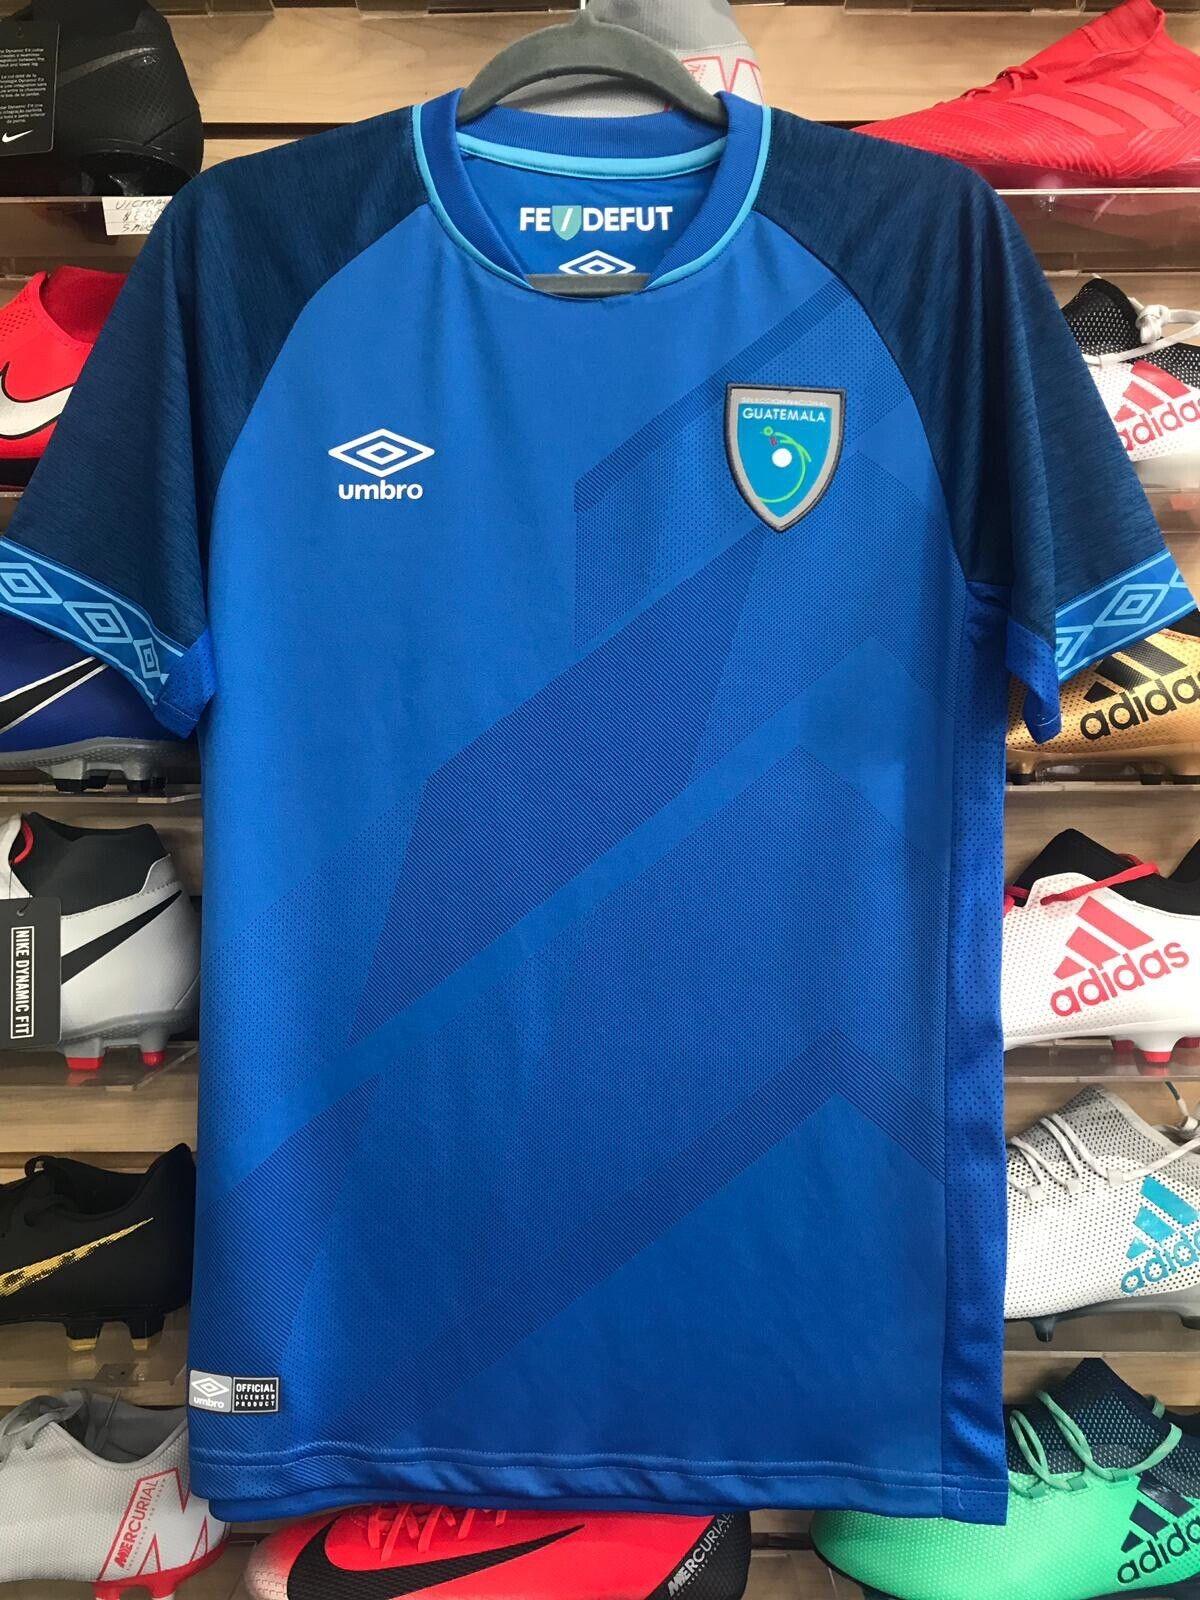 Umbro Guatemala 2019 Fútbol Jersey nueva playera de Guatemala 2019 Talla XL